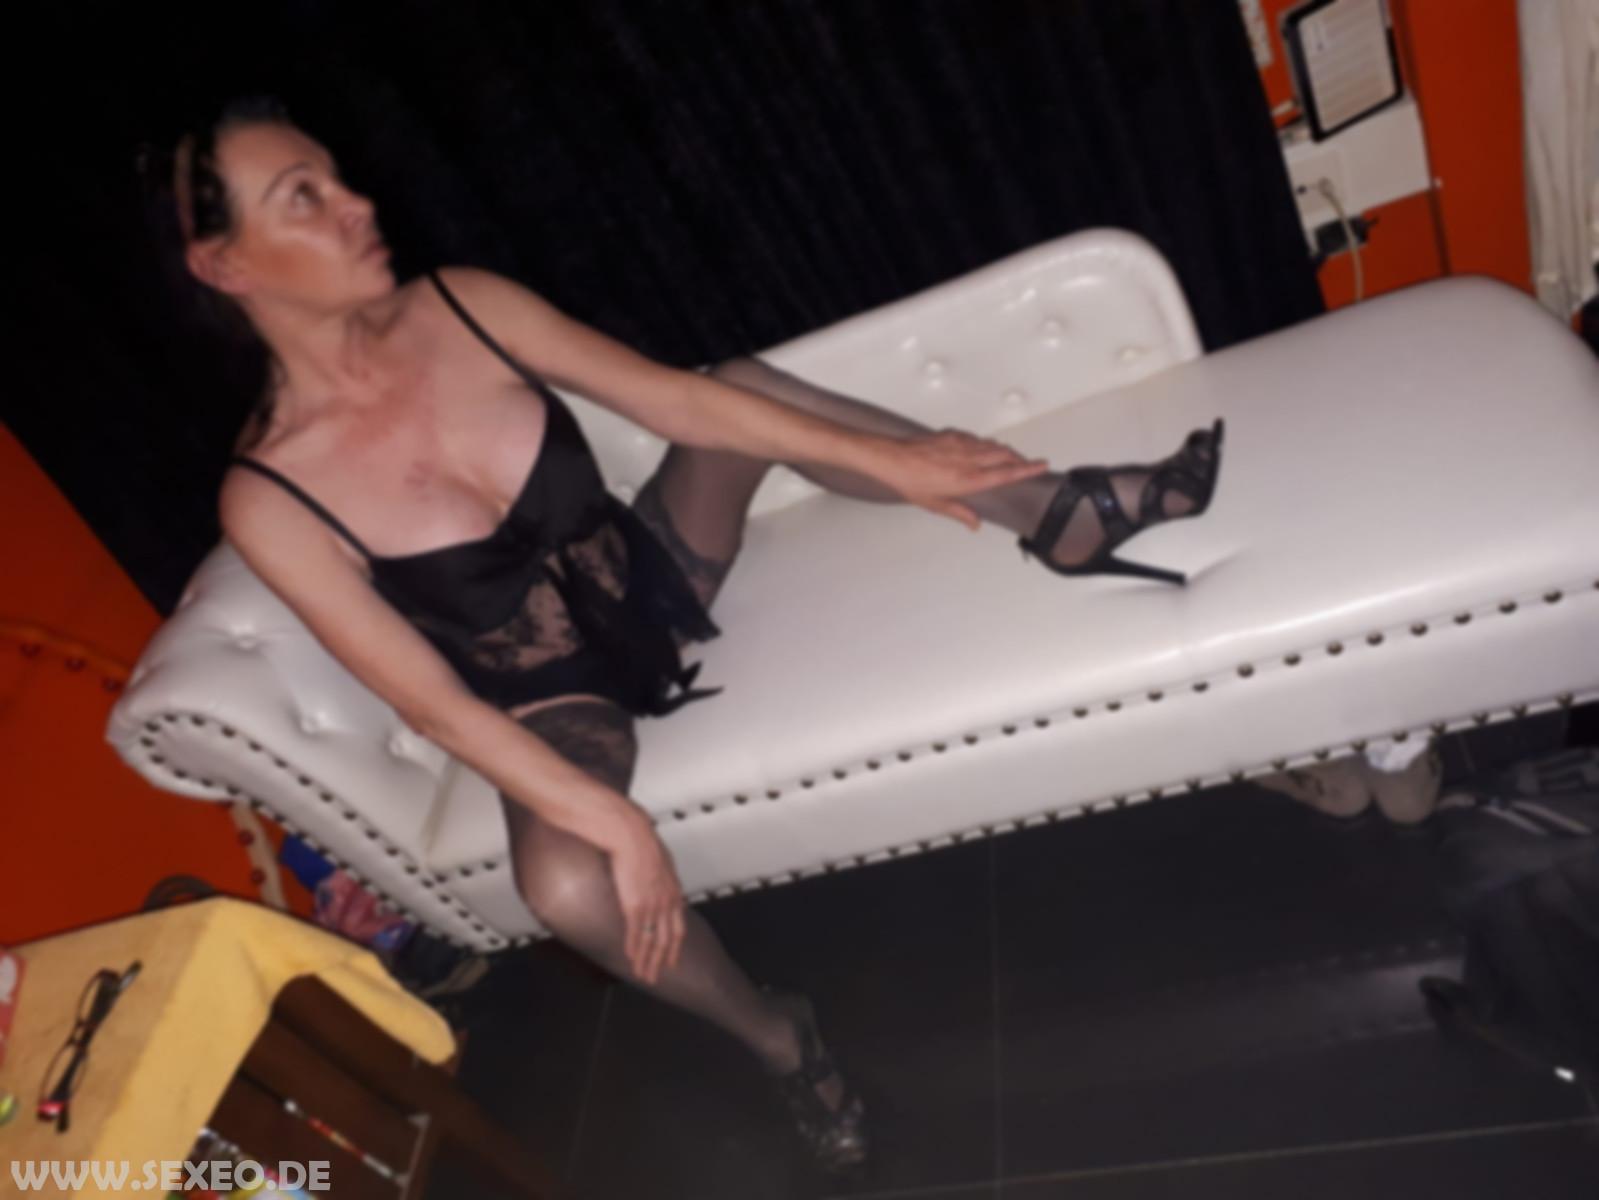 Mellie-NS-&-KV-Queen_1582123312223